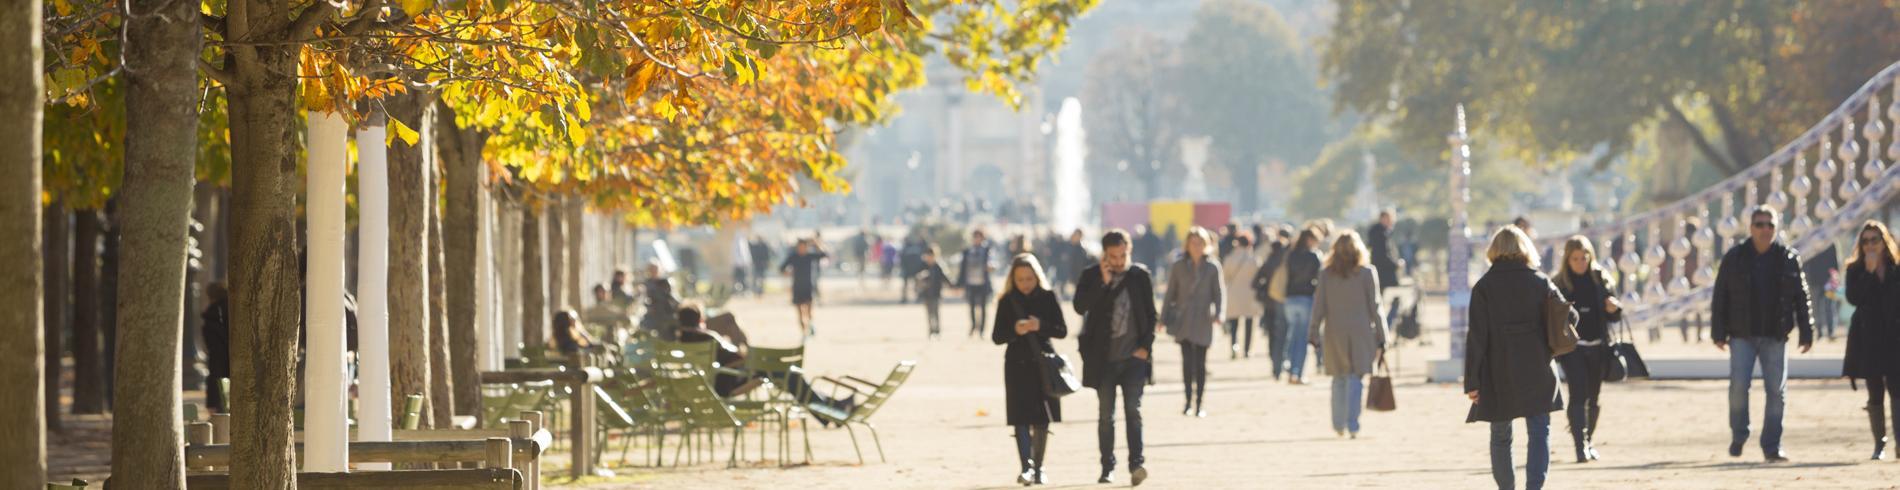 Paris in autumn, walking in the park